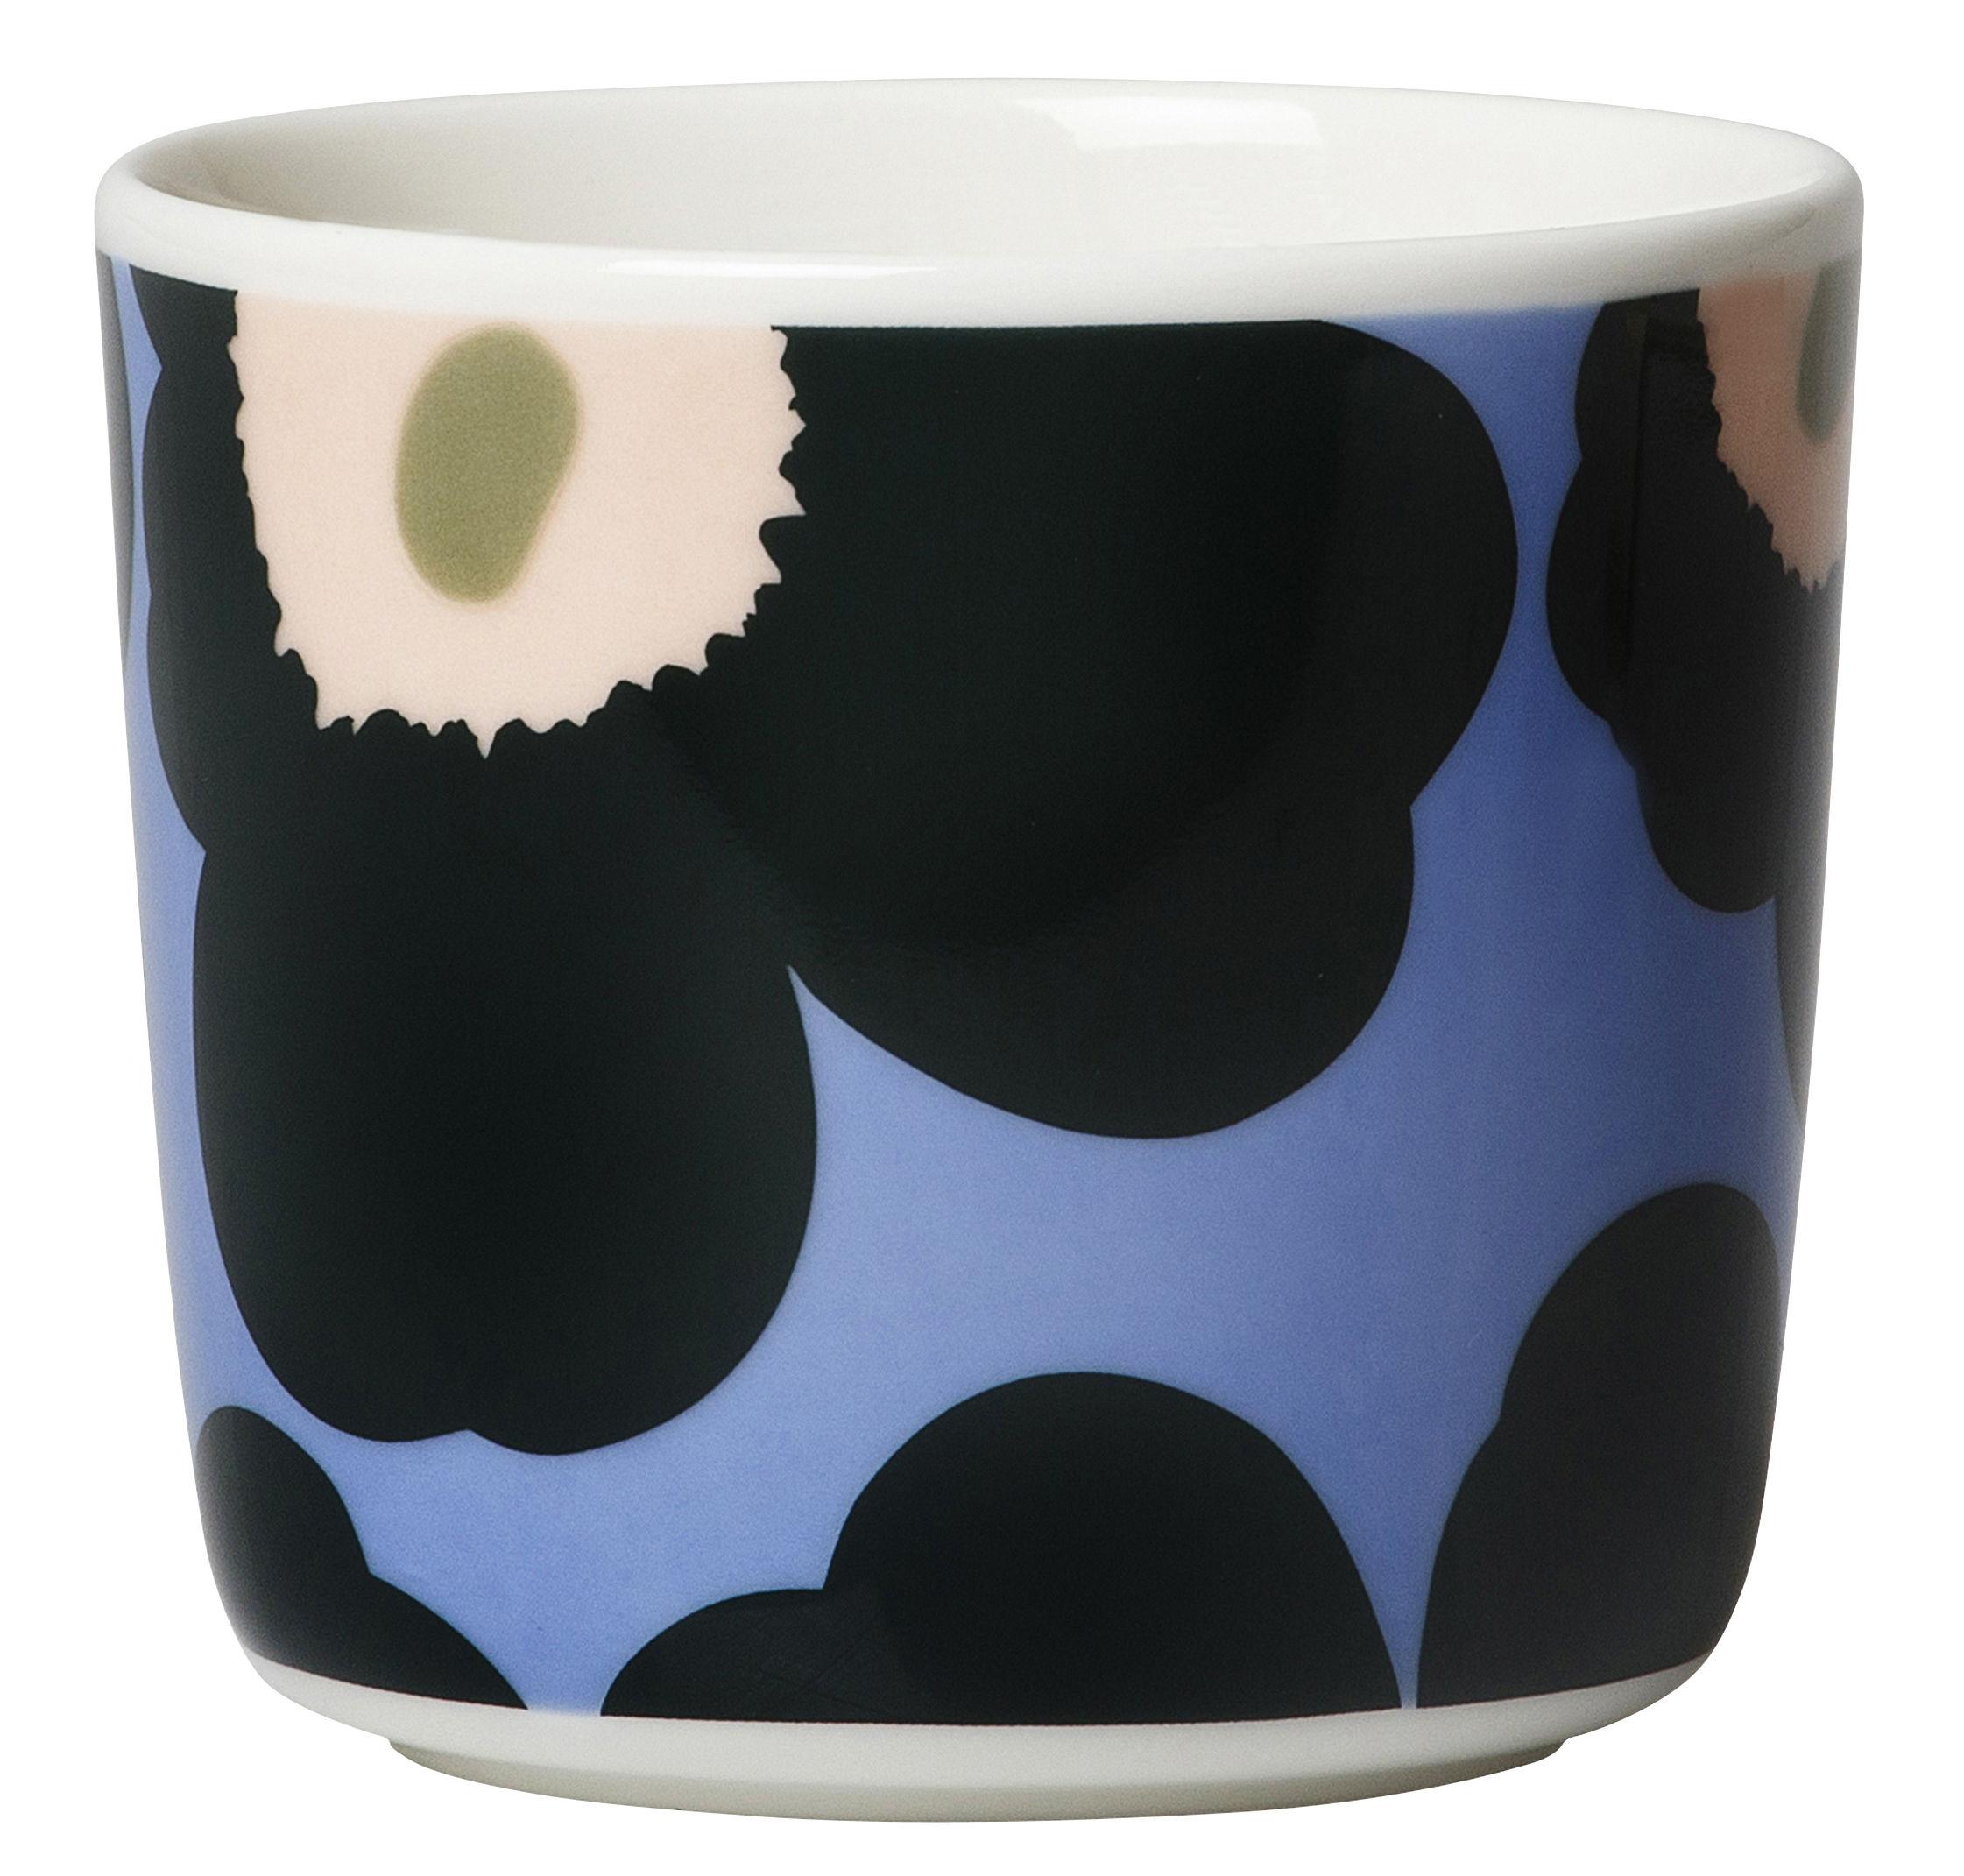 unikko kaffeetasse ohne henkel 2er set unikko hellblau by marimekko made in design. Black Bedroom Furniture Sets. Home Design Ideas